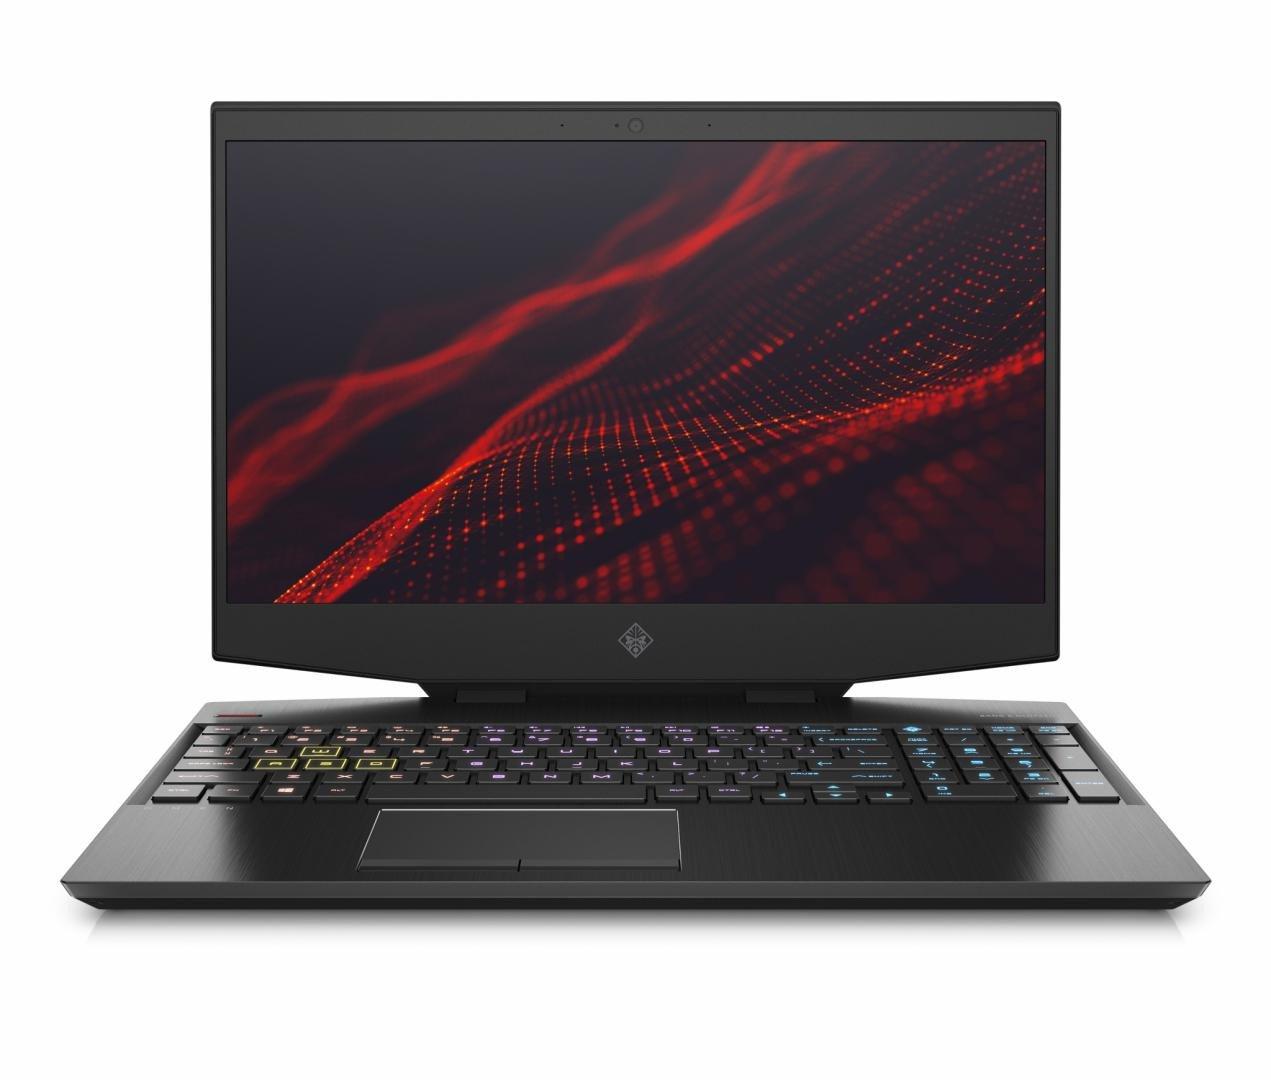 "NOTEBOOK HP OMEN 15.6"" FHD i7-10750H 8GB 512GB 6GB-GTX1660Ti DOS   15-ek0000nq - imaginea 4"